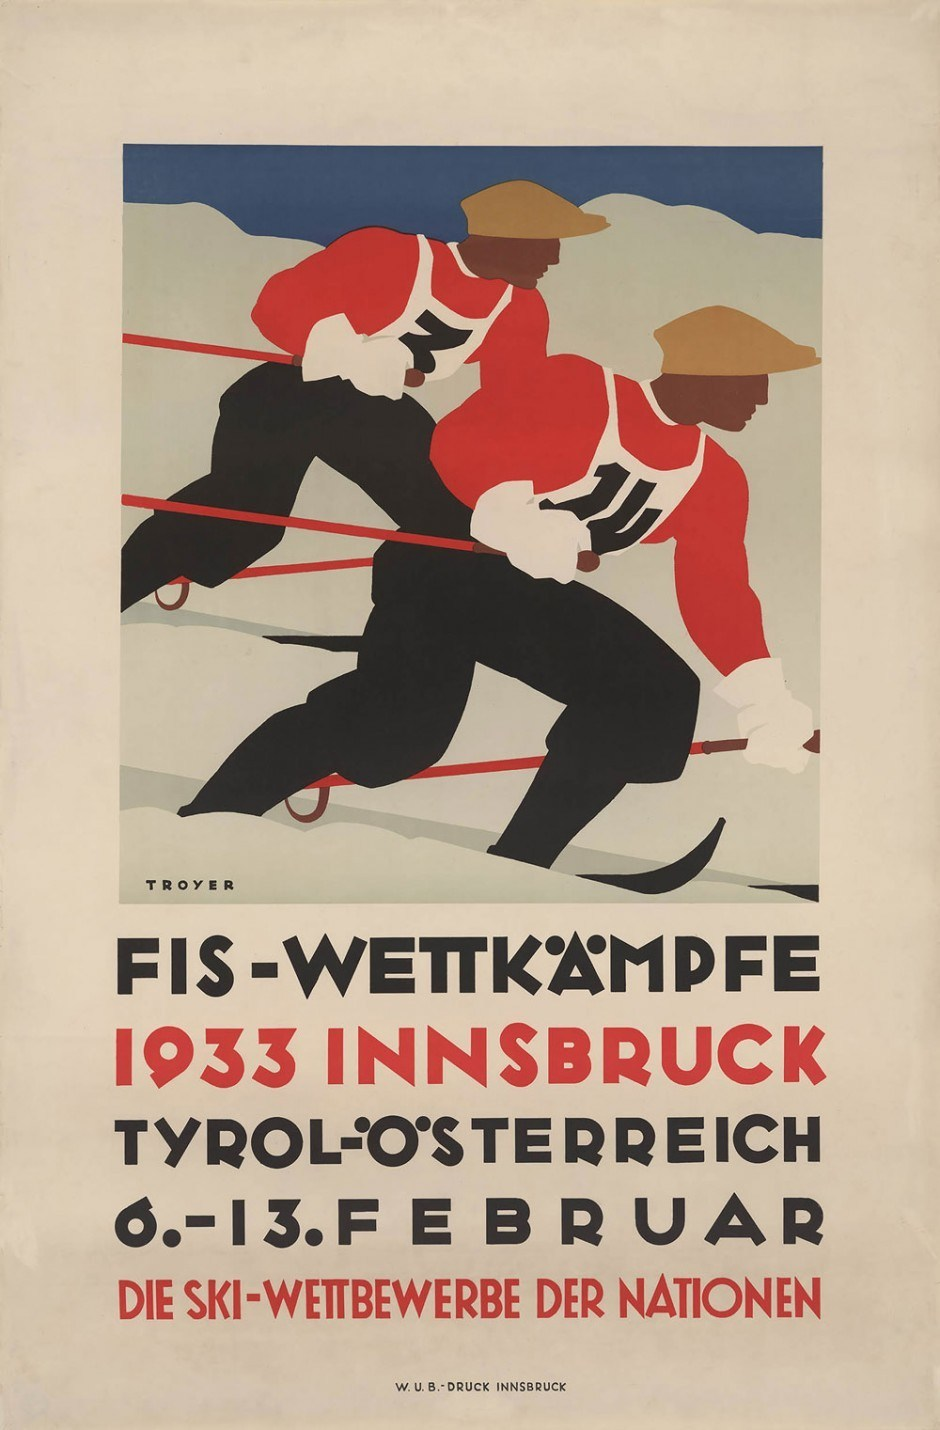 1933, Plakat, 62 × 94,4 cm, Tiroler Landesmuseum Ferdinandeum